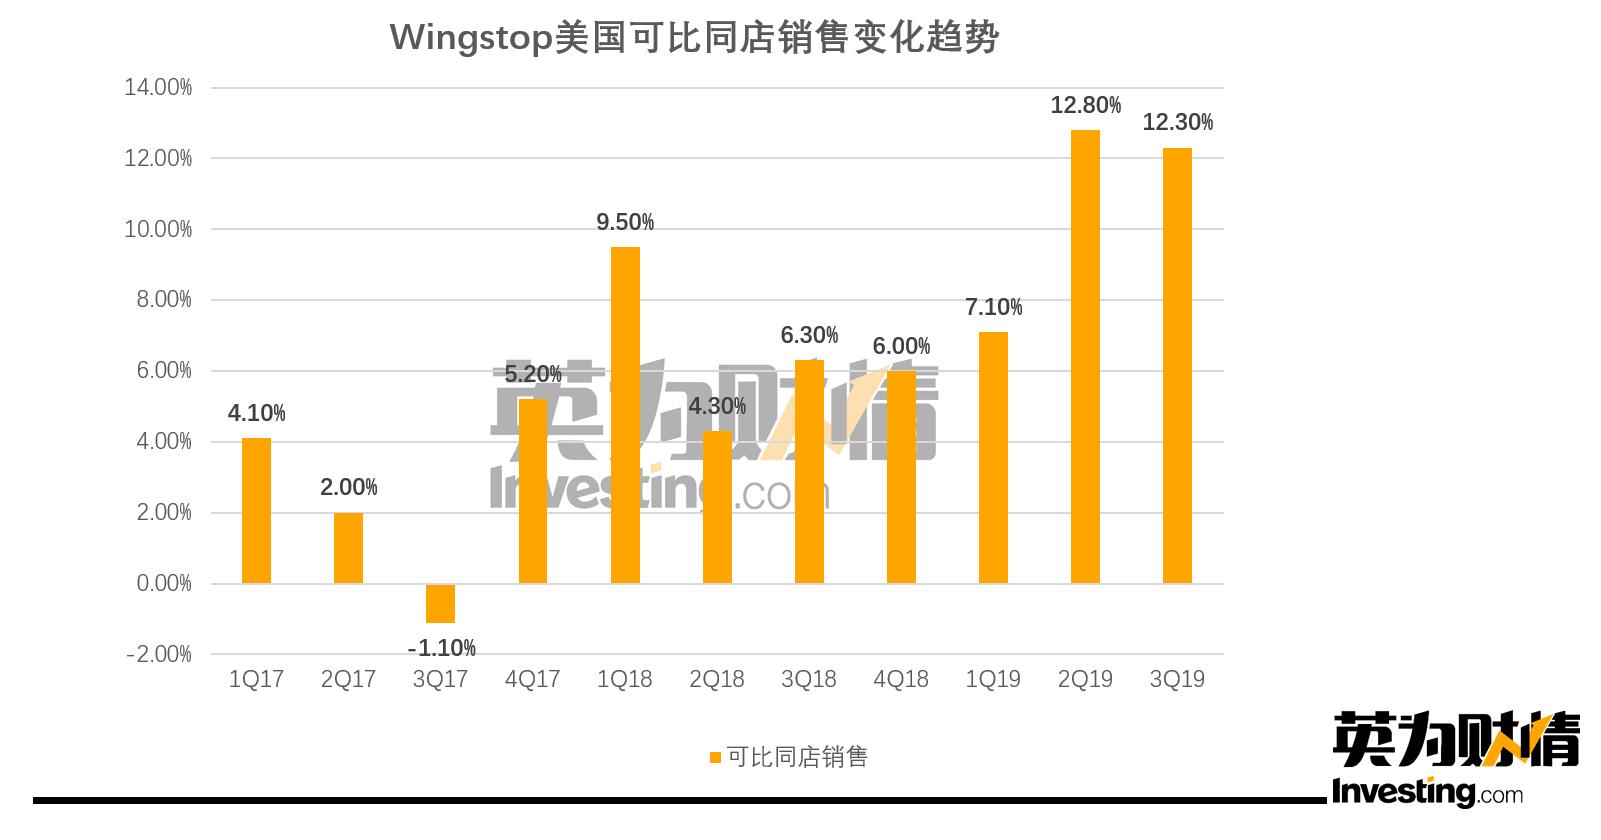 Wingstop四年涨近300%的背后:销售增长甩麦当劳一条街?